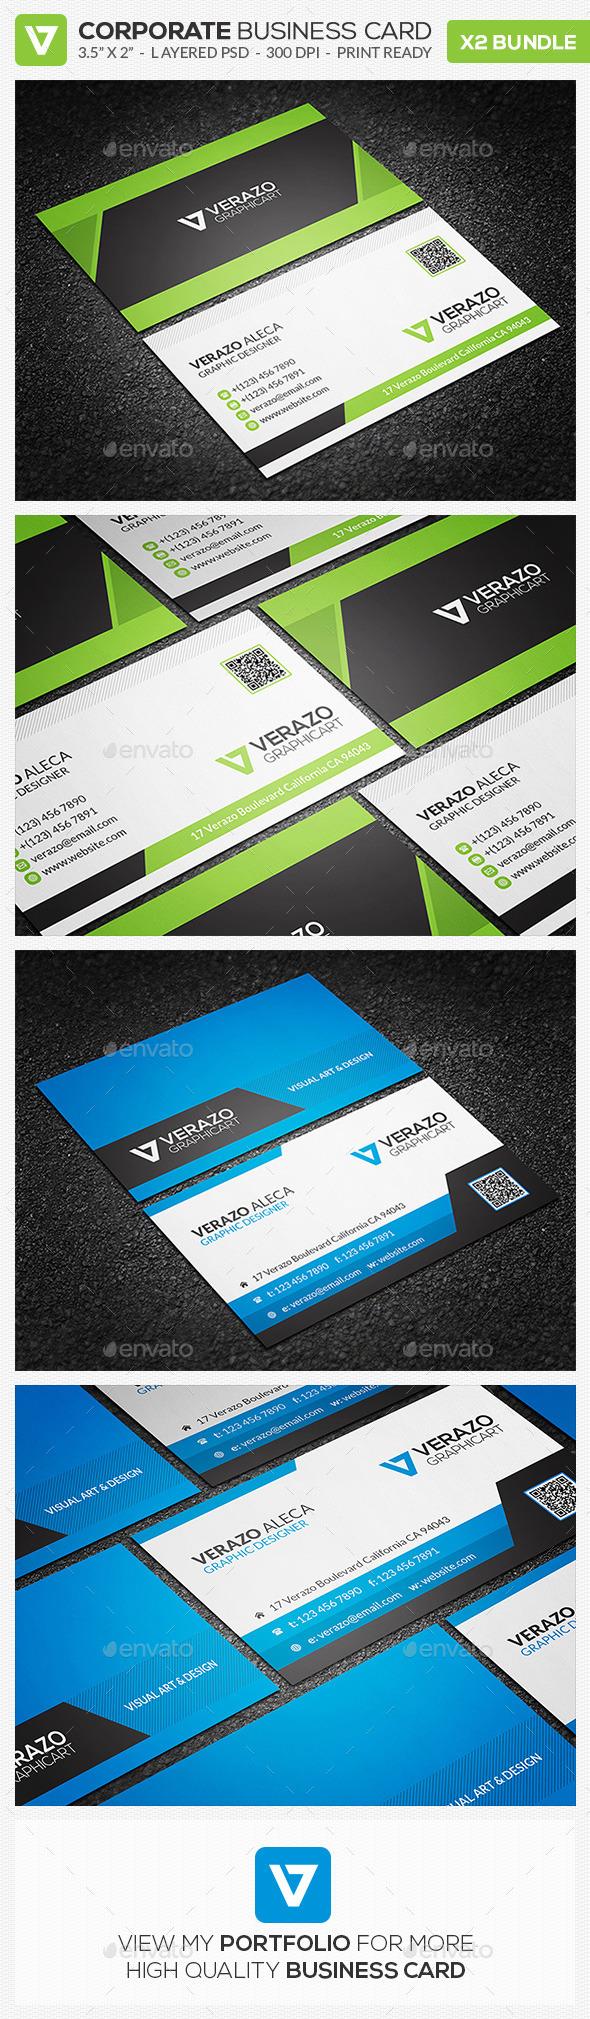 Business Card Bundle 18 - Corporate Business Cards